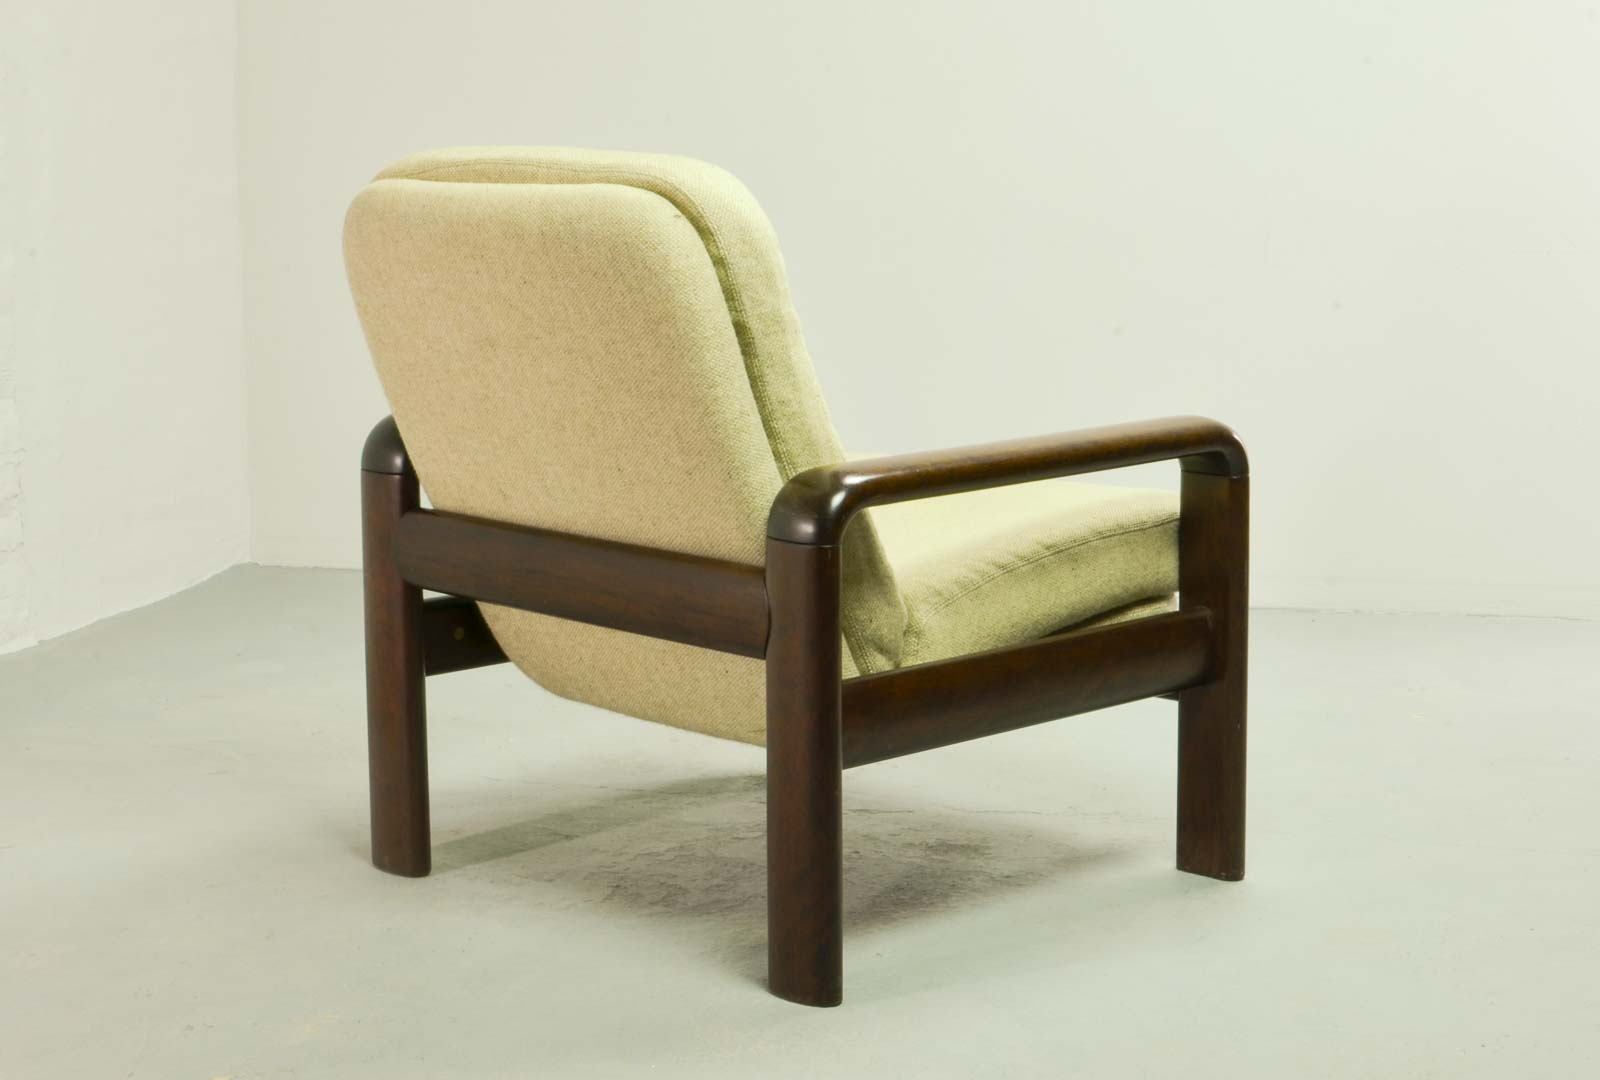 chair design scandinavian slipcovered parsons chairs dyrlund shortback lounge 1960s